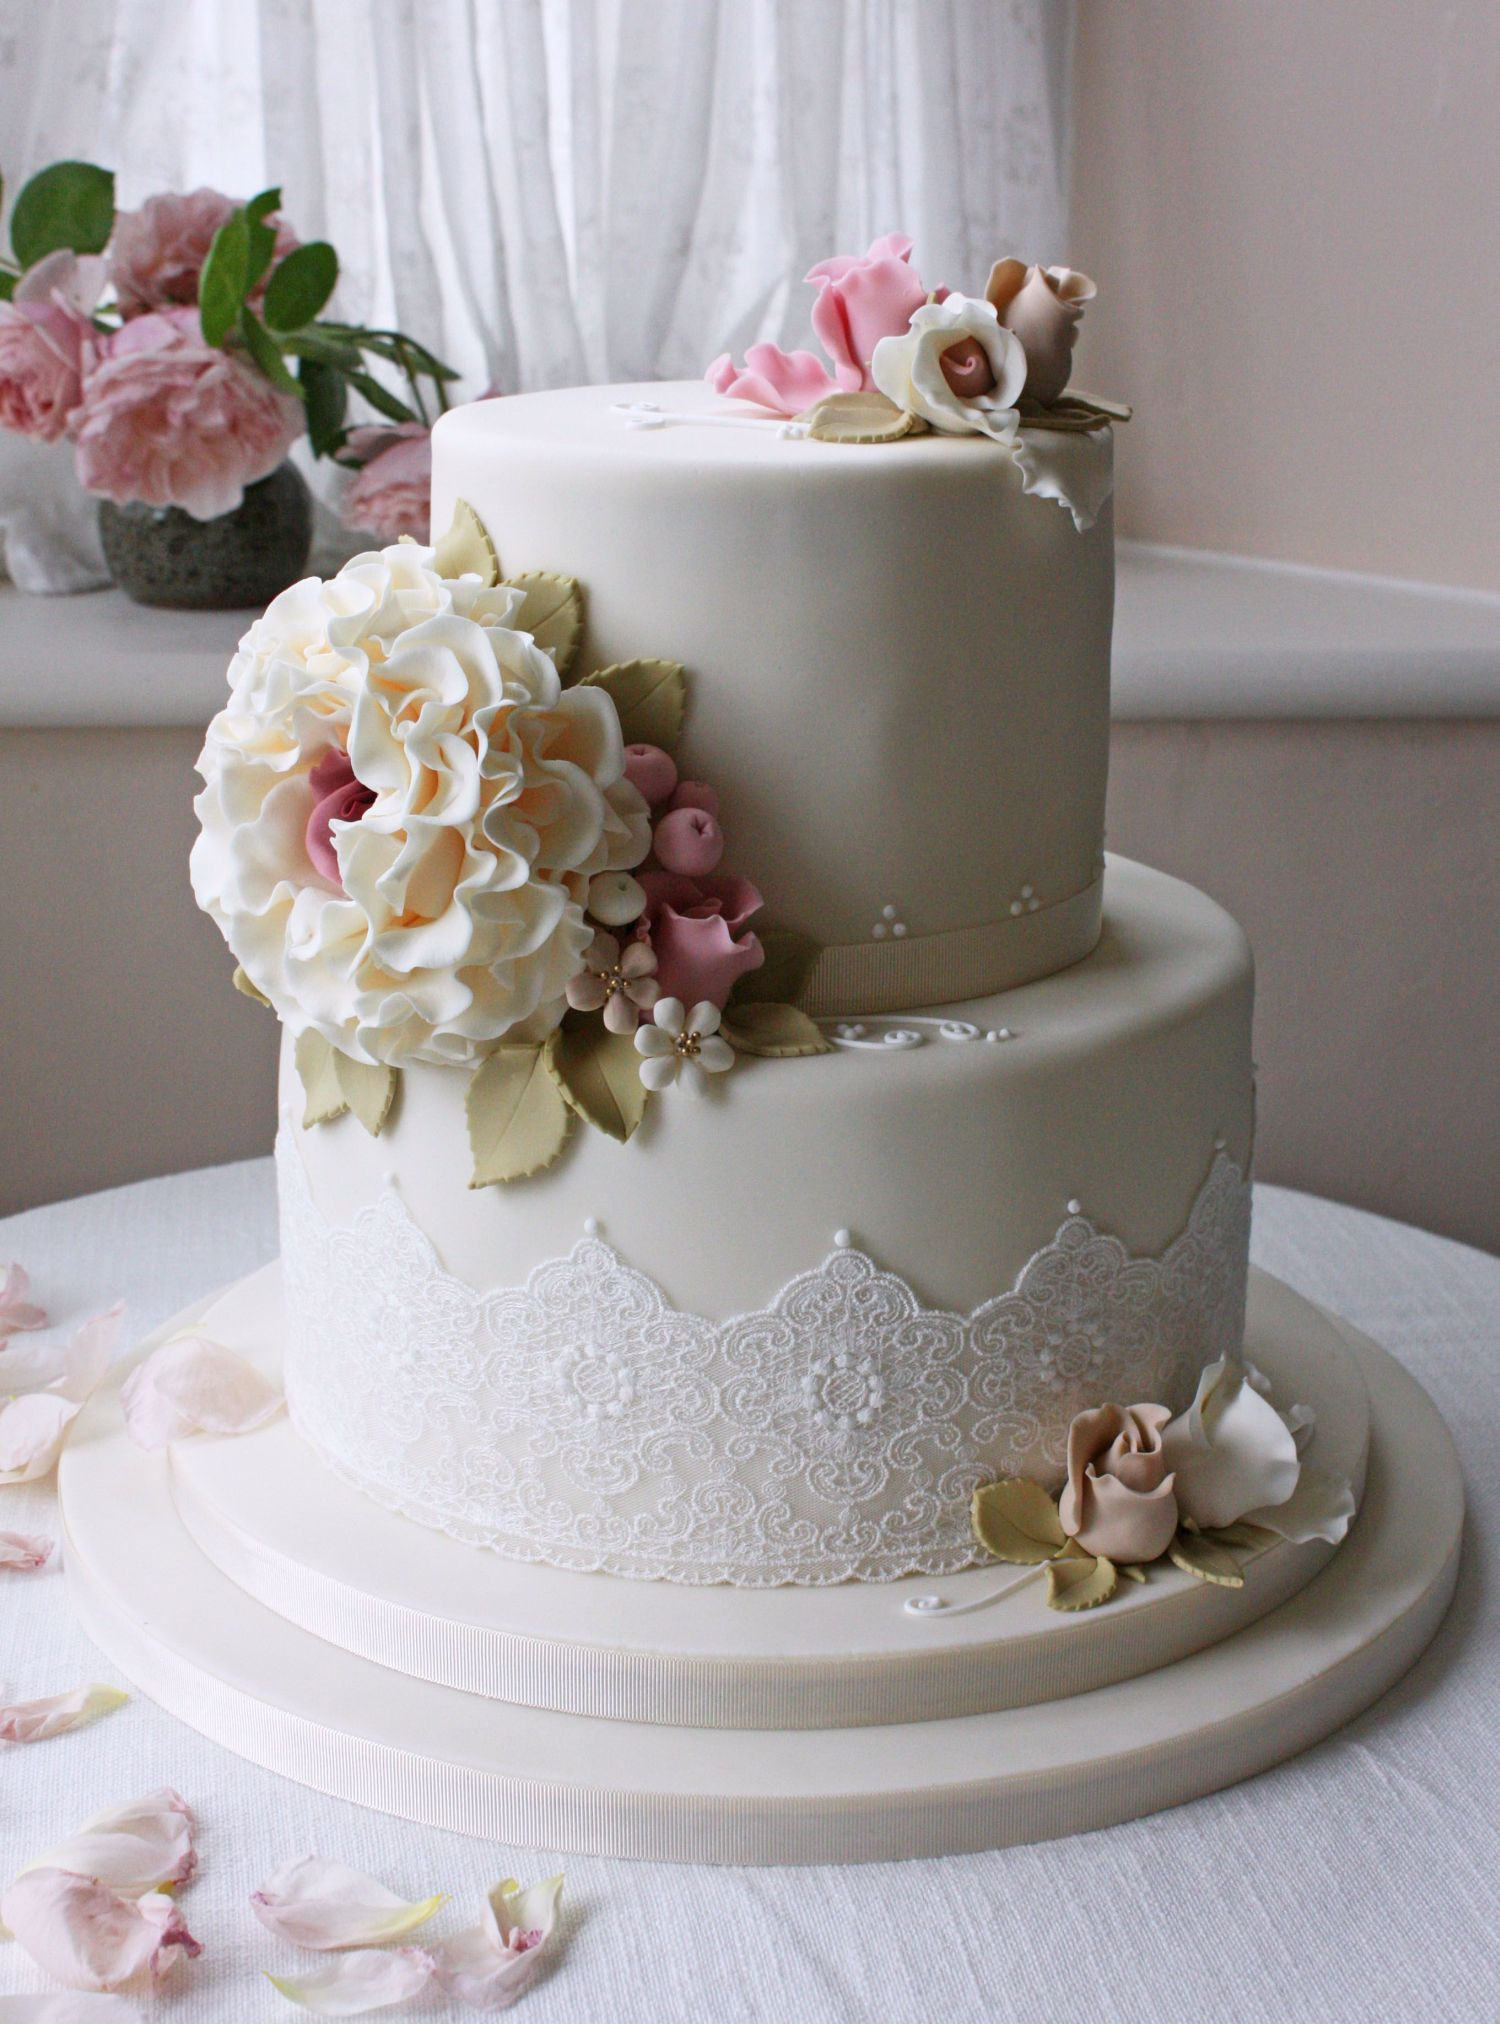 2 Tier Wedding Cakes  Wedding Cake Ideas